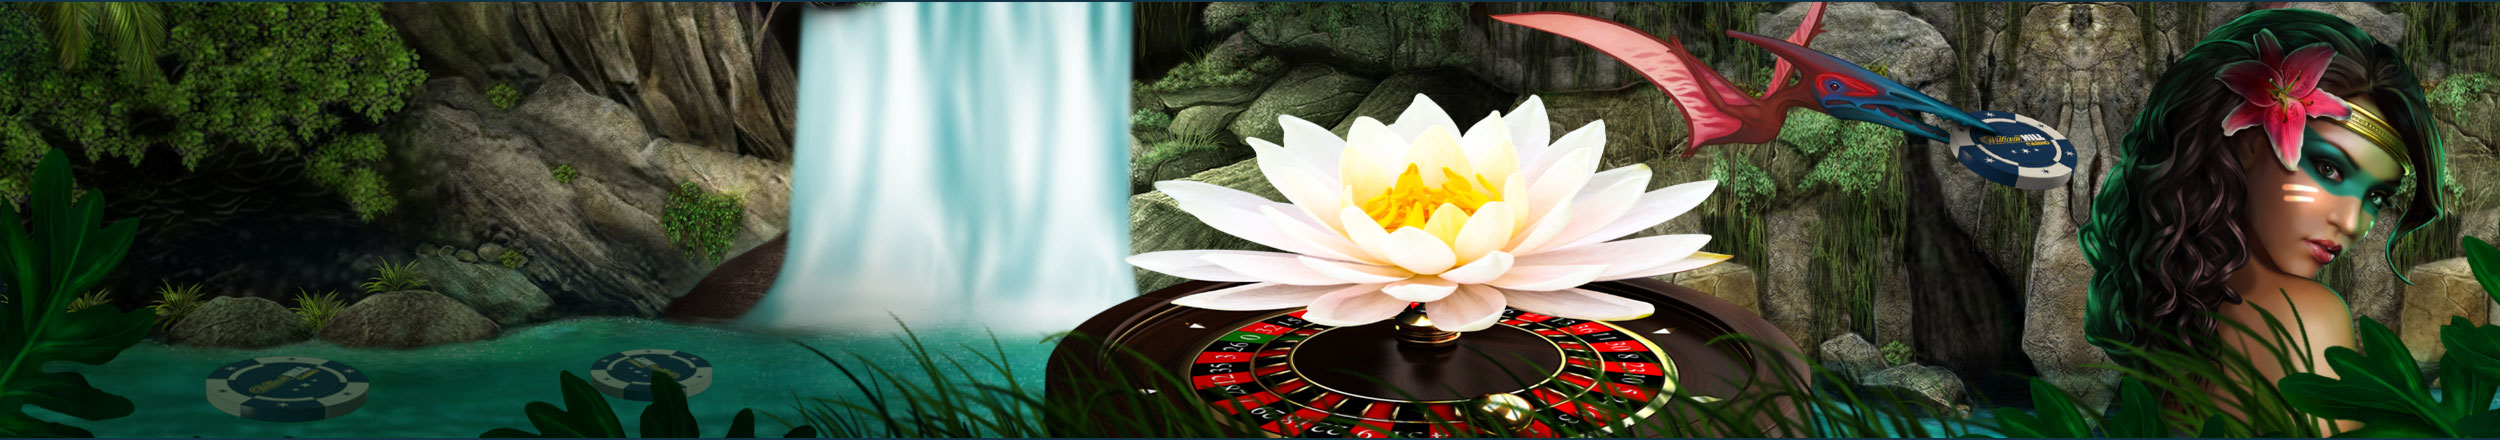 Пополните счет и играйте с бонусом $15 в William Hill Casino